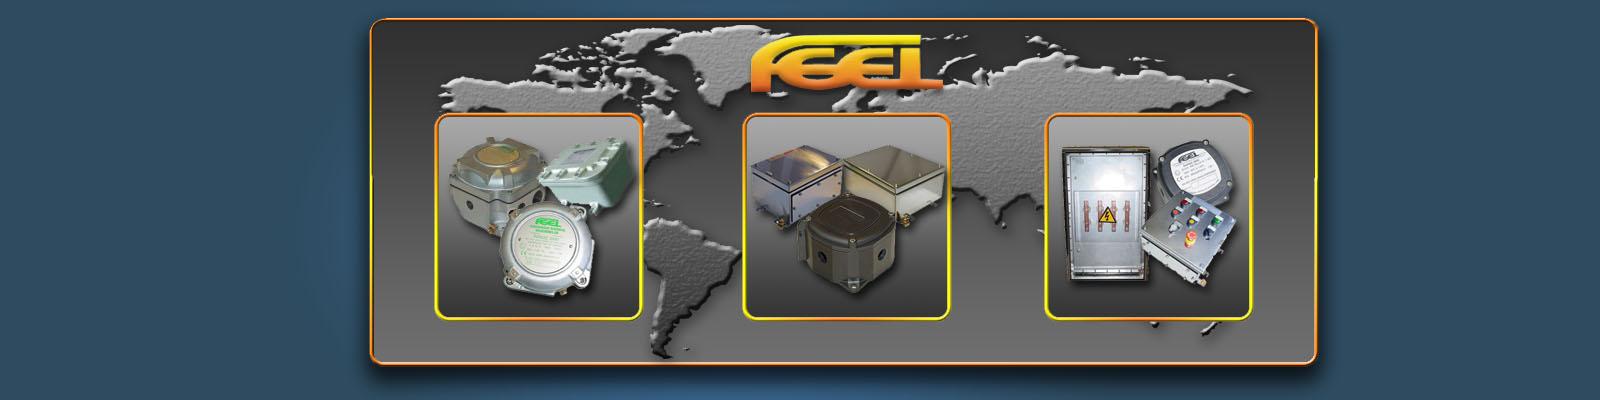 Flameproof Electrical Enclosures Ltd – FEEL